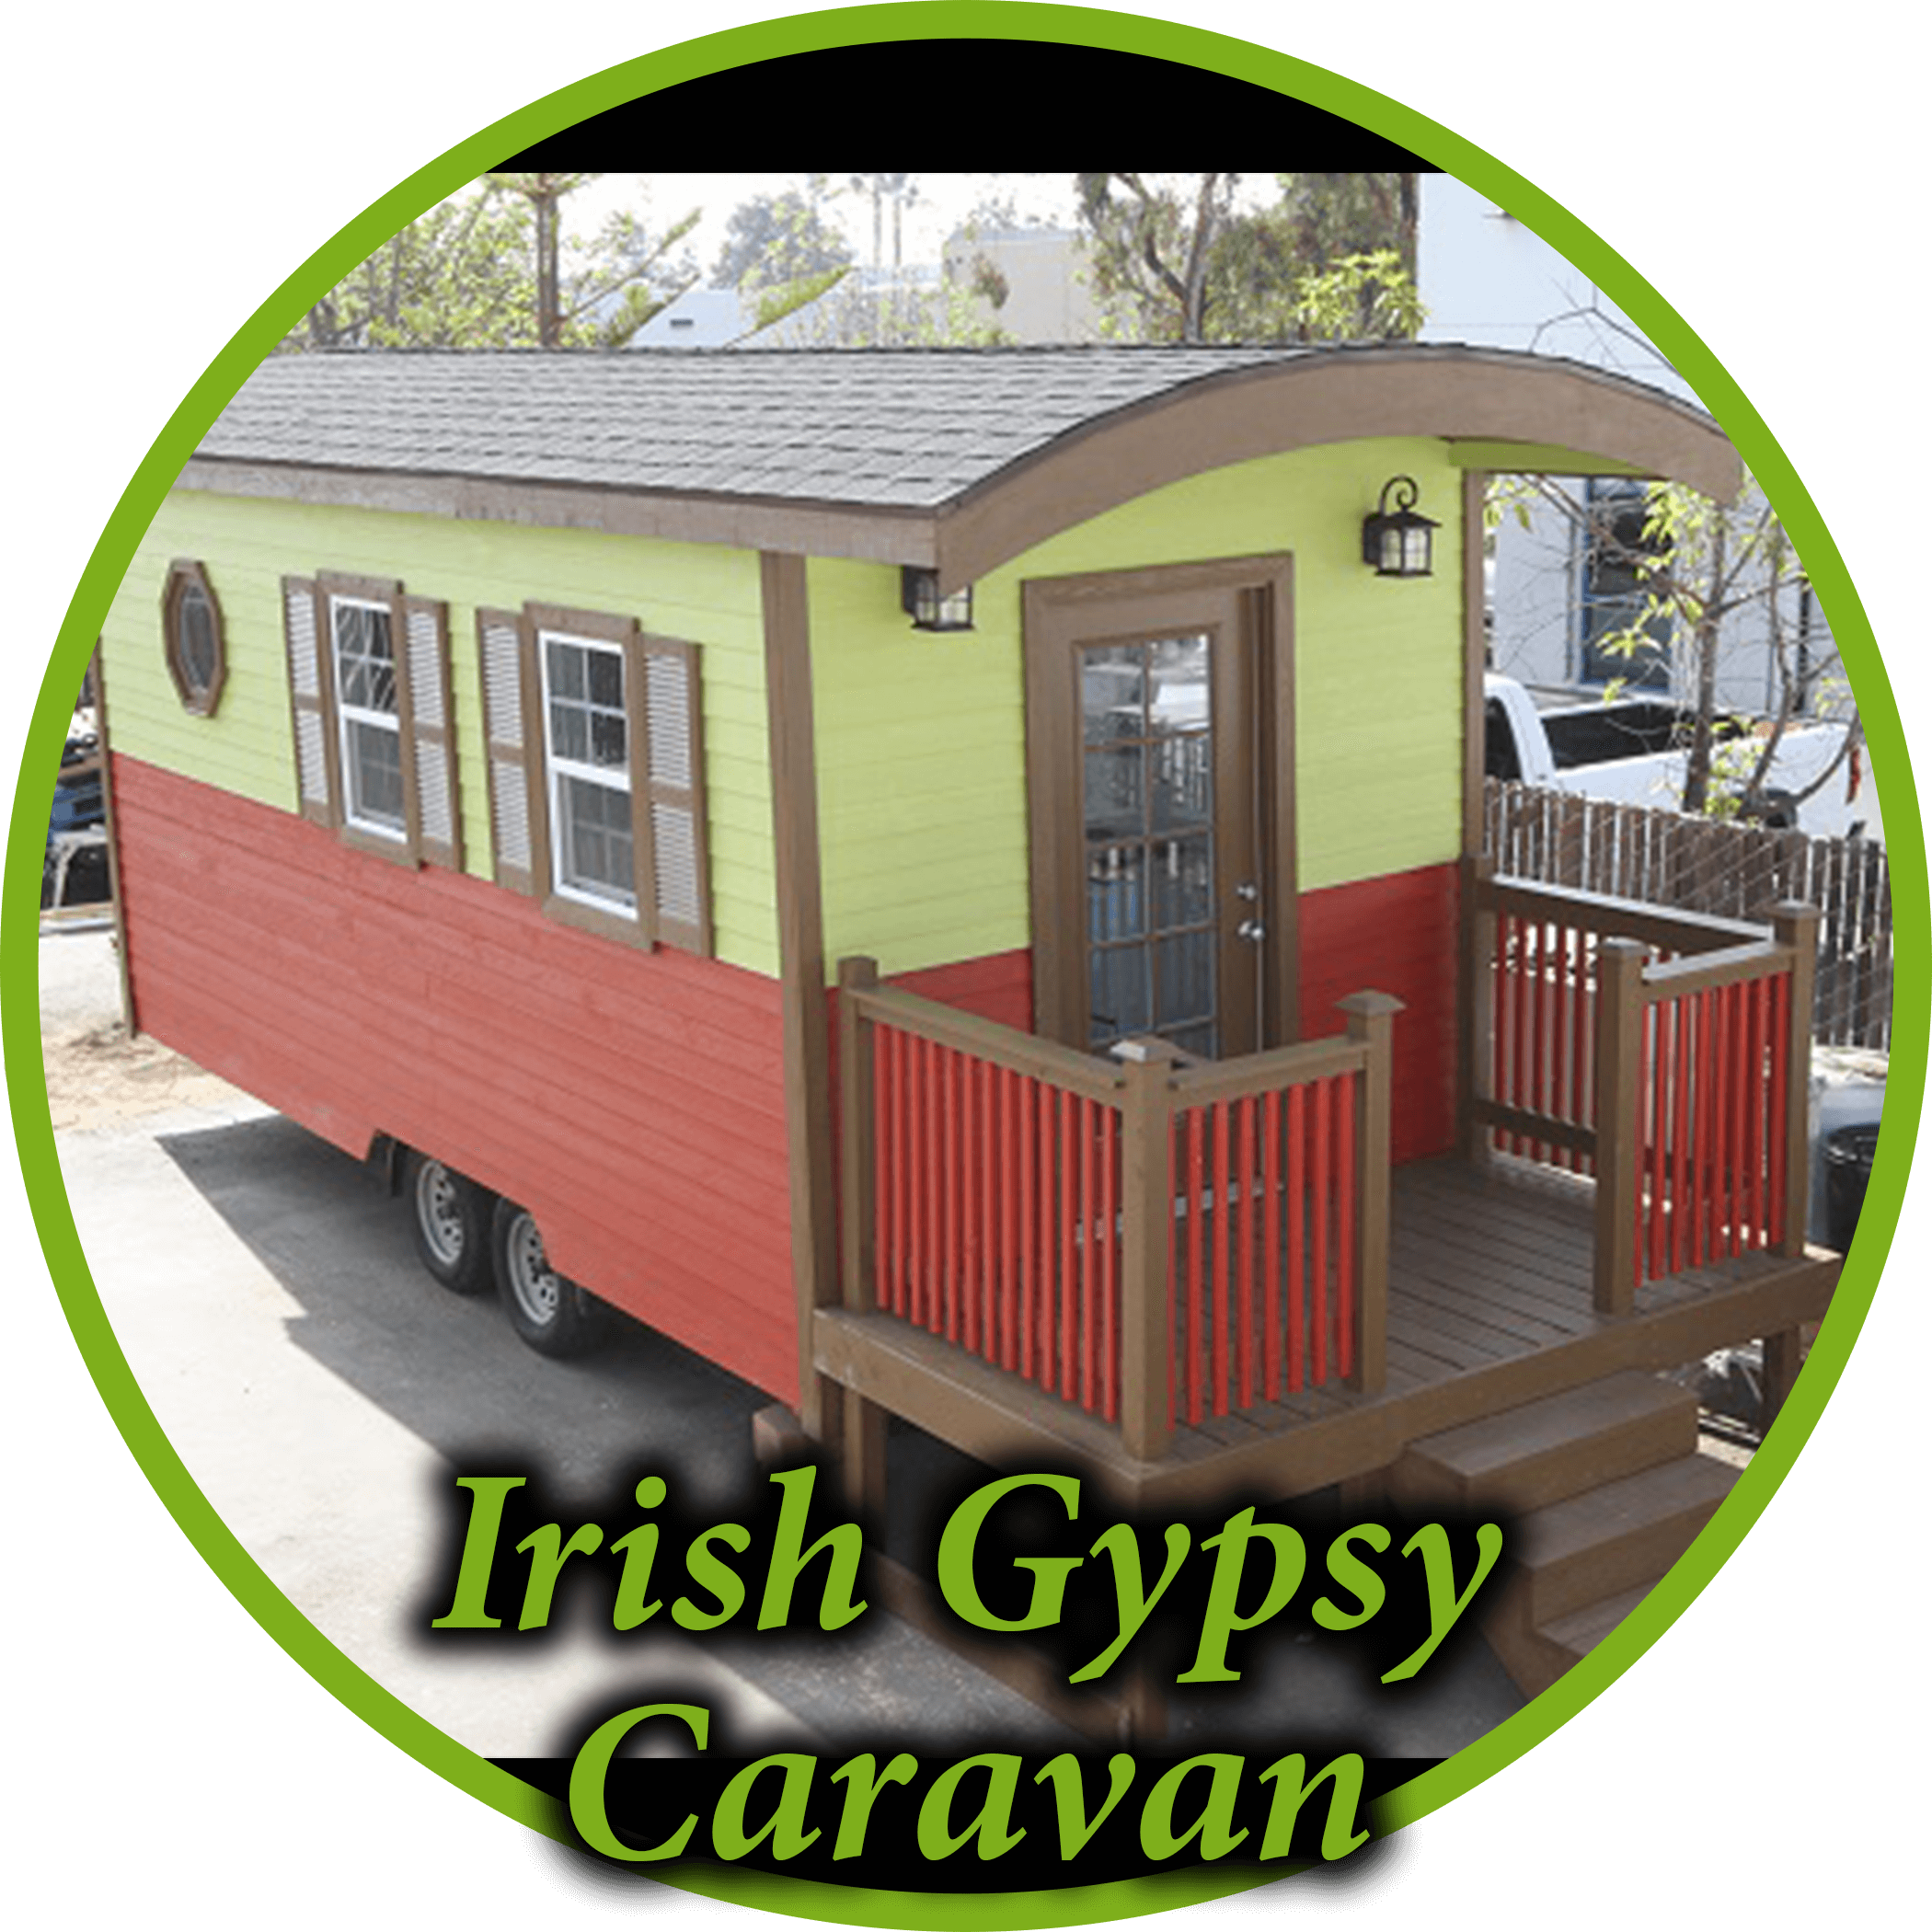 irish gypsy caravan circle (optimized).png